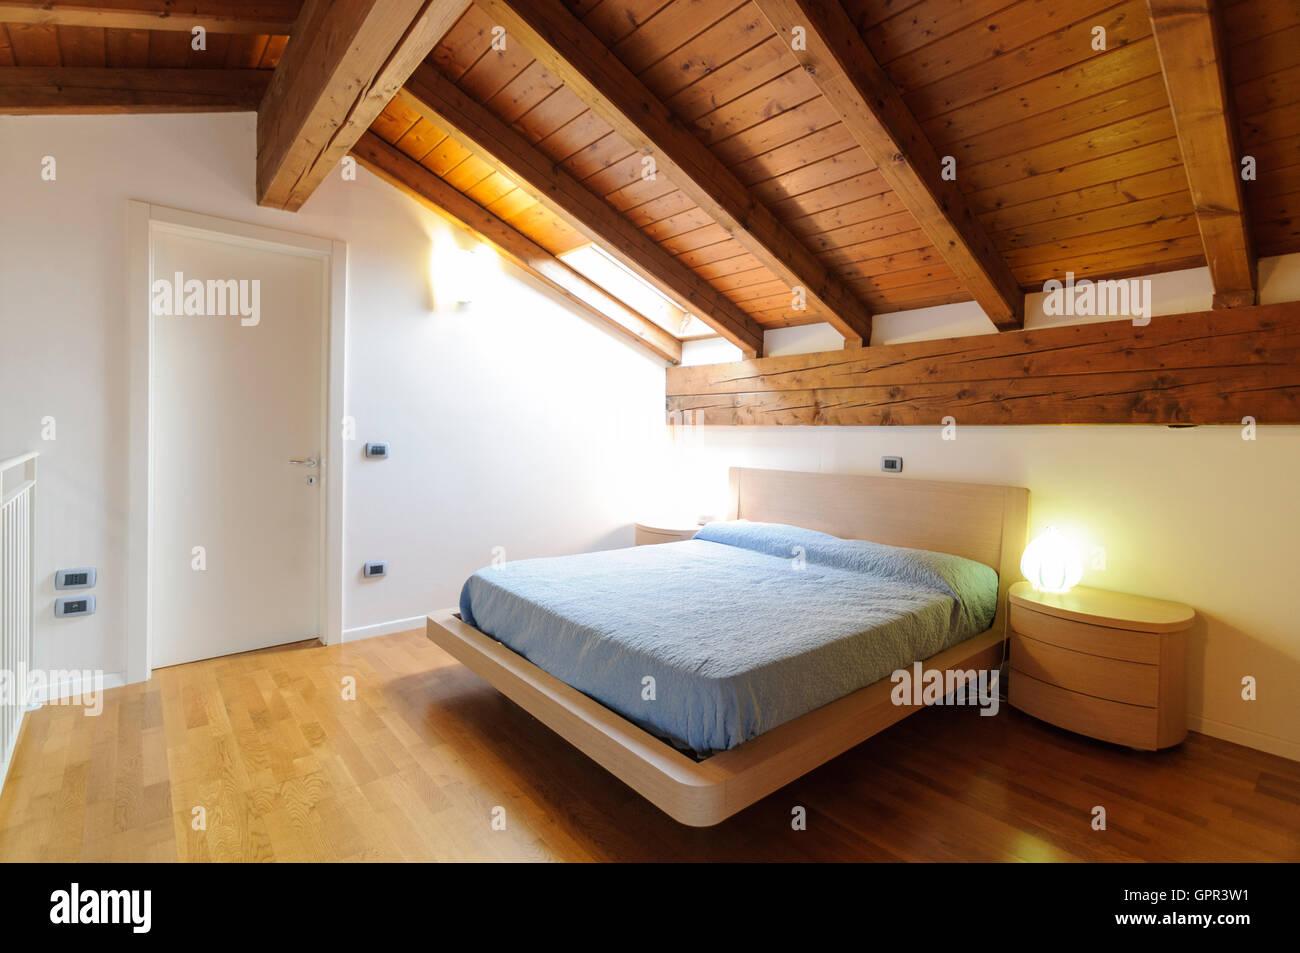 Ceiling furniture immagini & ceiling furniture fotos stock alamy